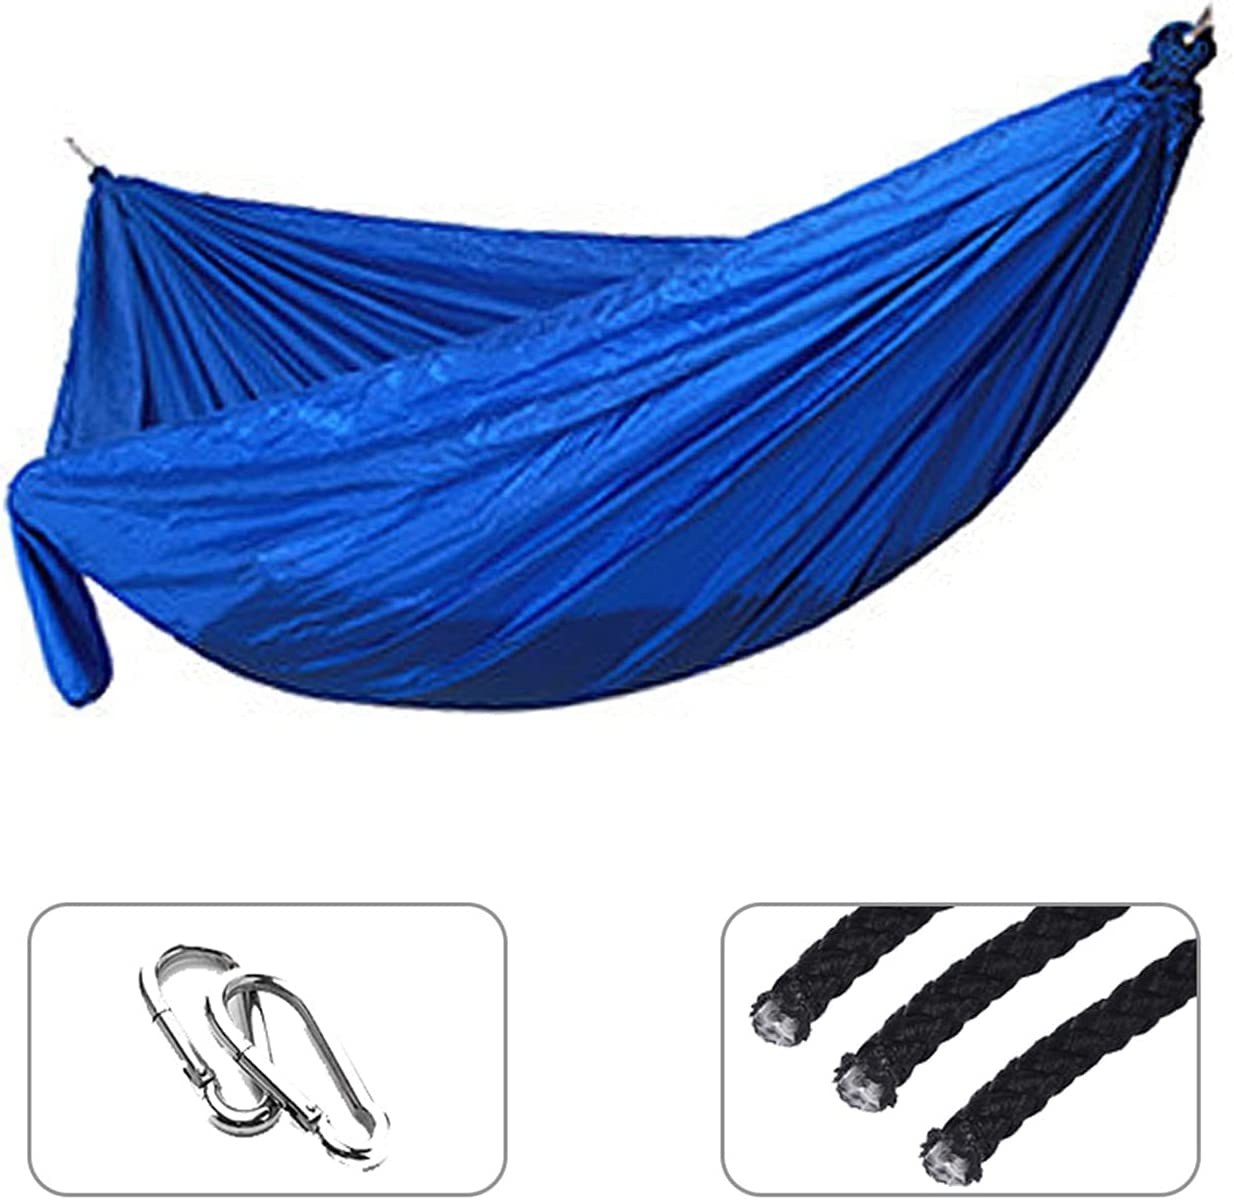 ppqq Very Practical Ultralight Outdoor Camping Hammock Department Choice store Sleep Swi